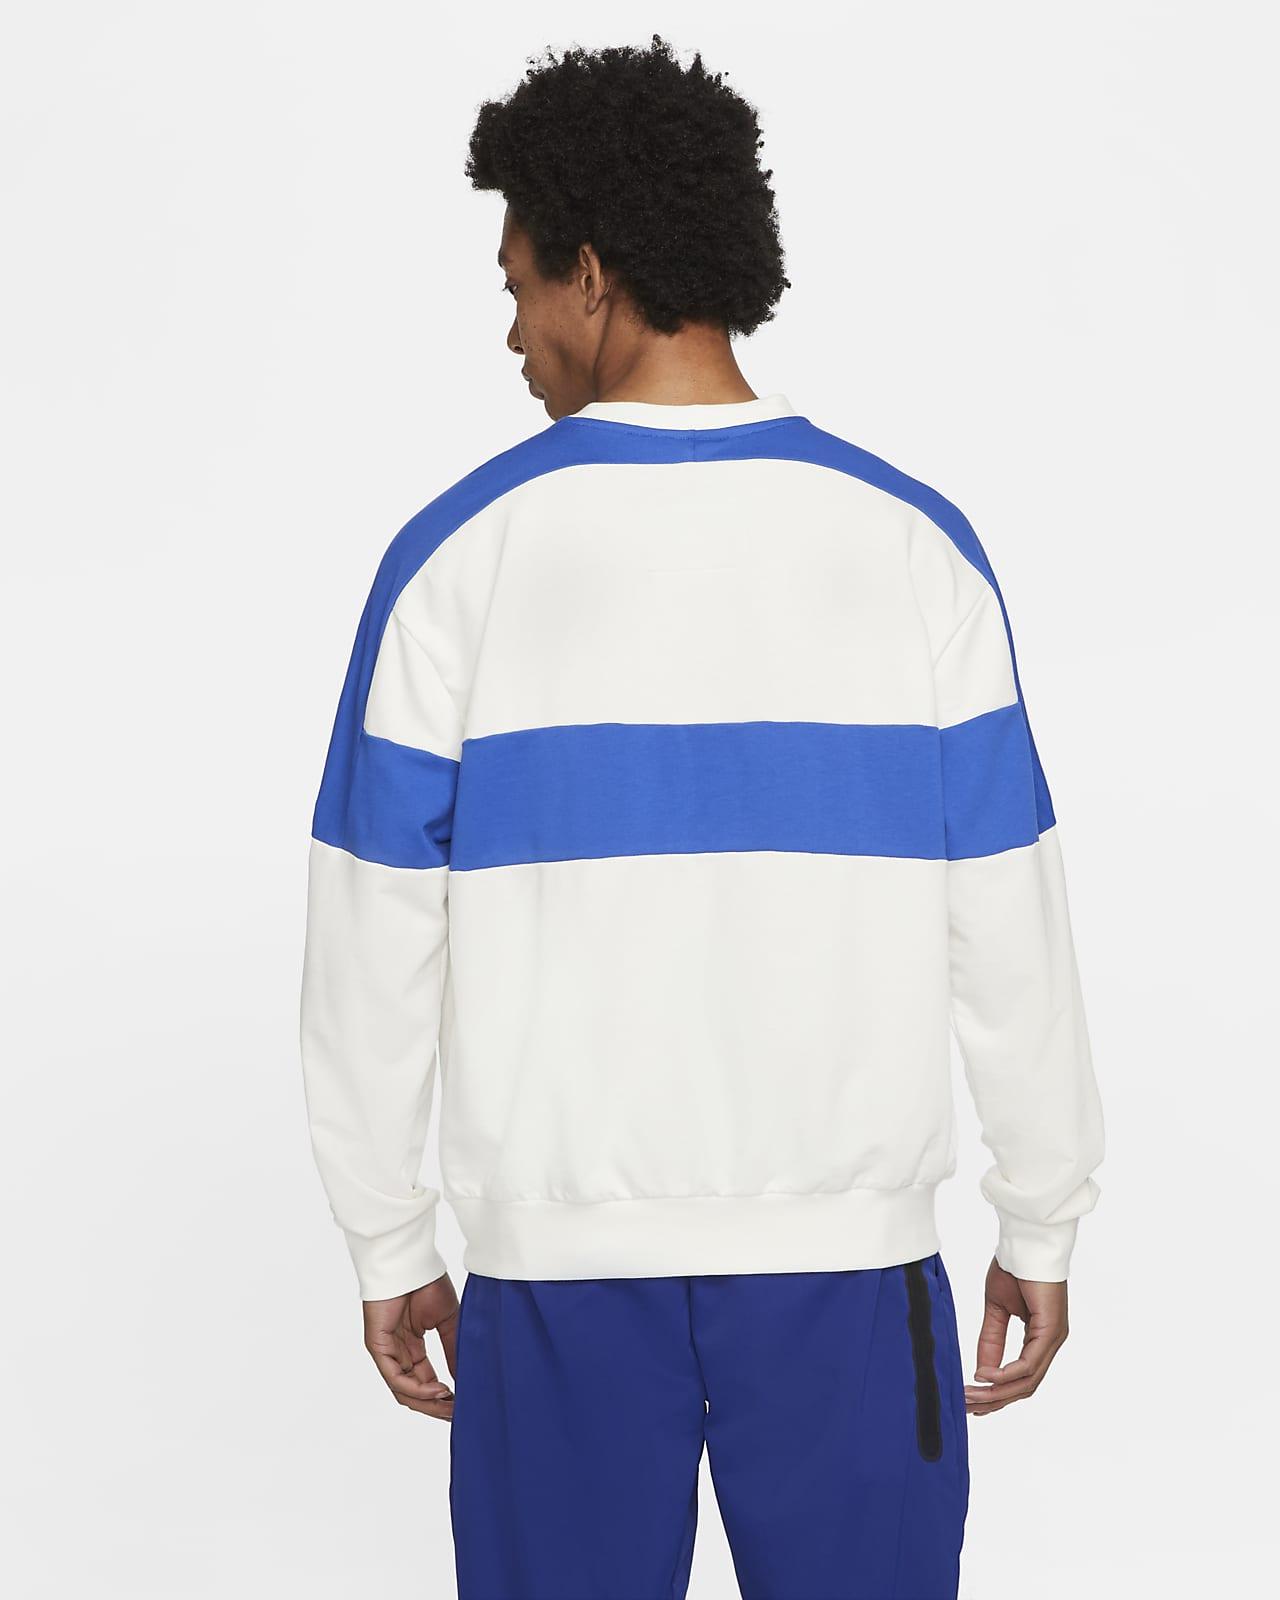 Nike Sportswear Reissue Men S French Terry Crew Nike Sa [ 1600 x 1280 Pixel ]